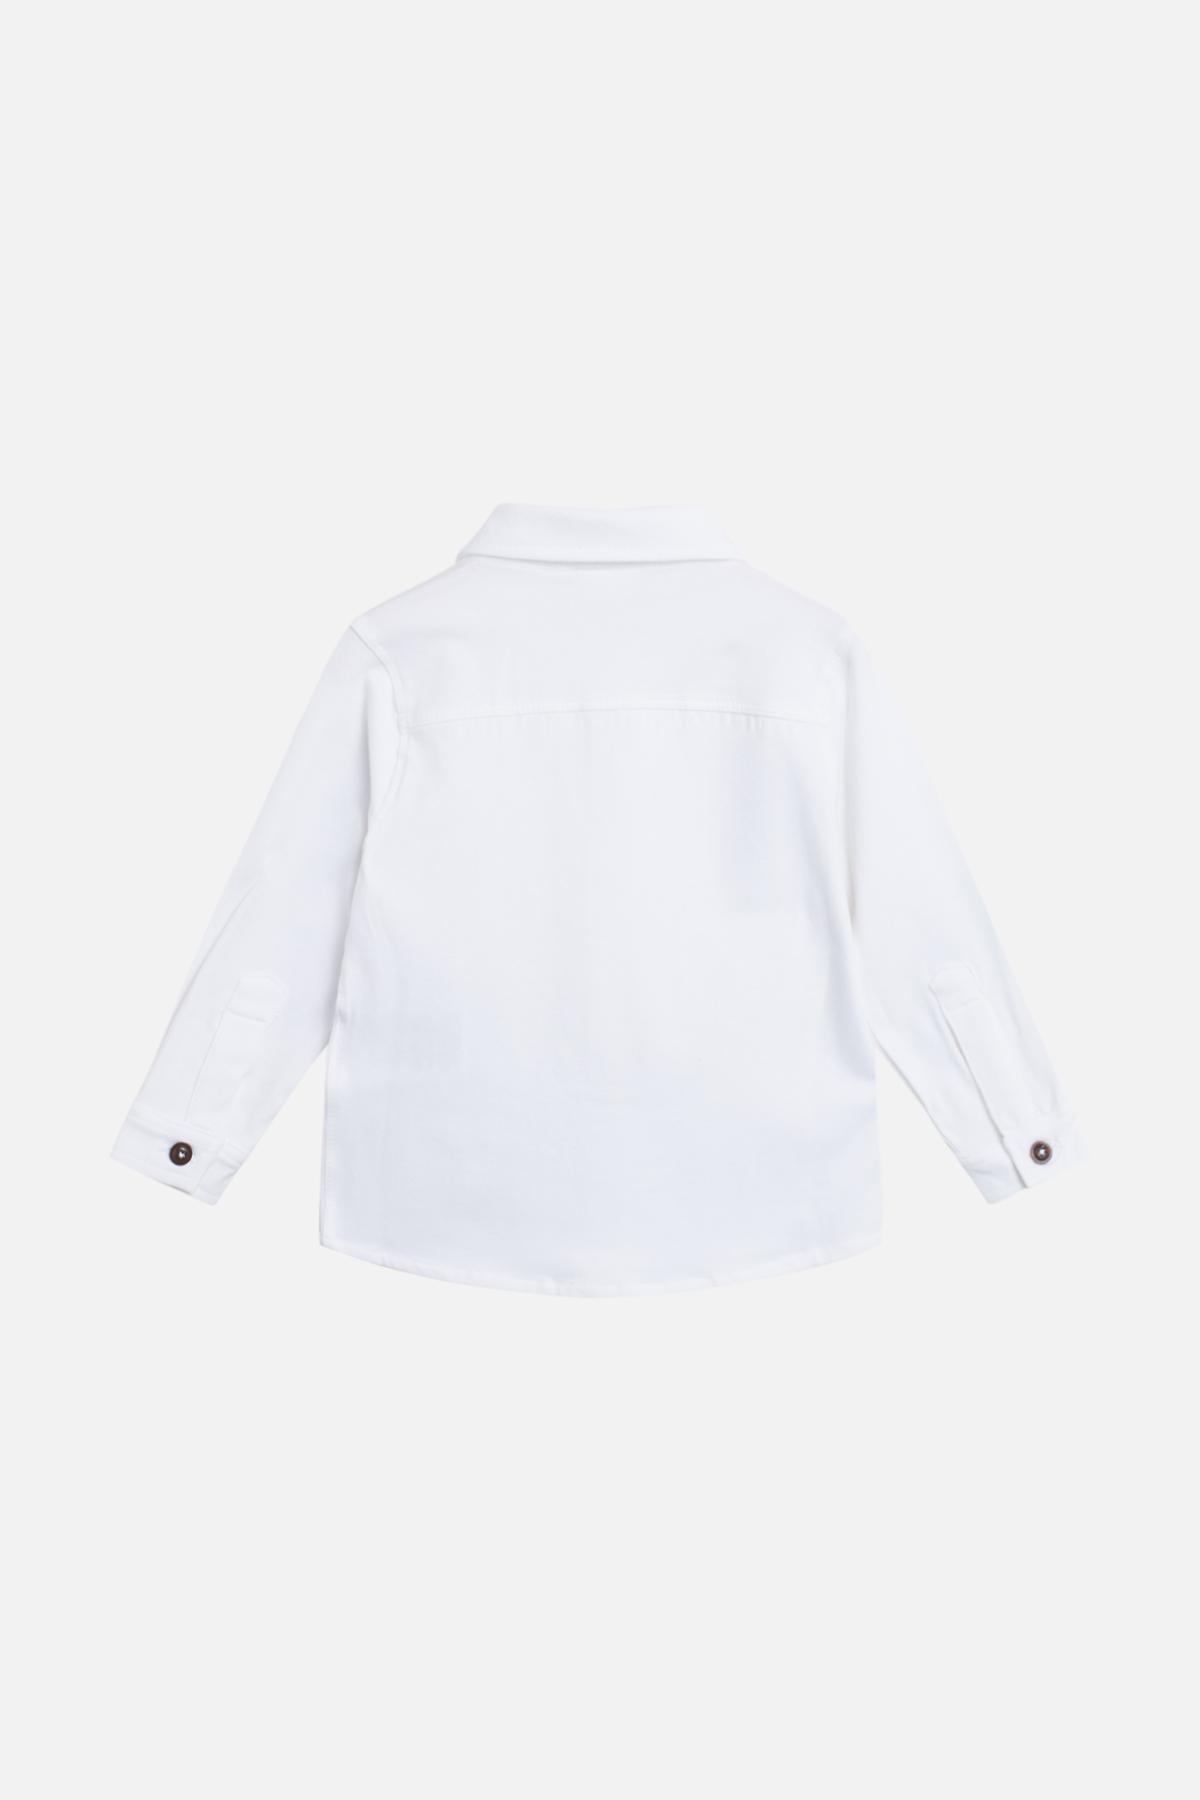 Boy - Rudy - Shirt